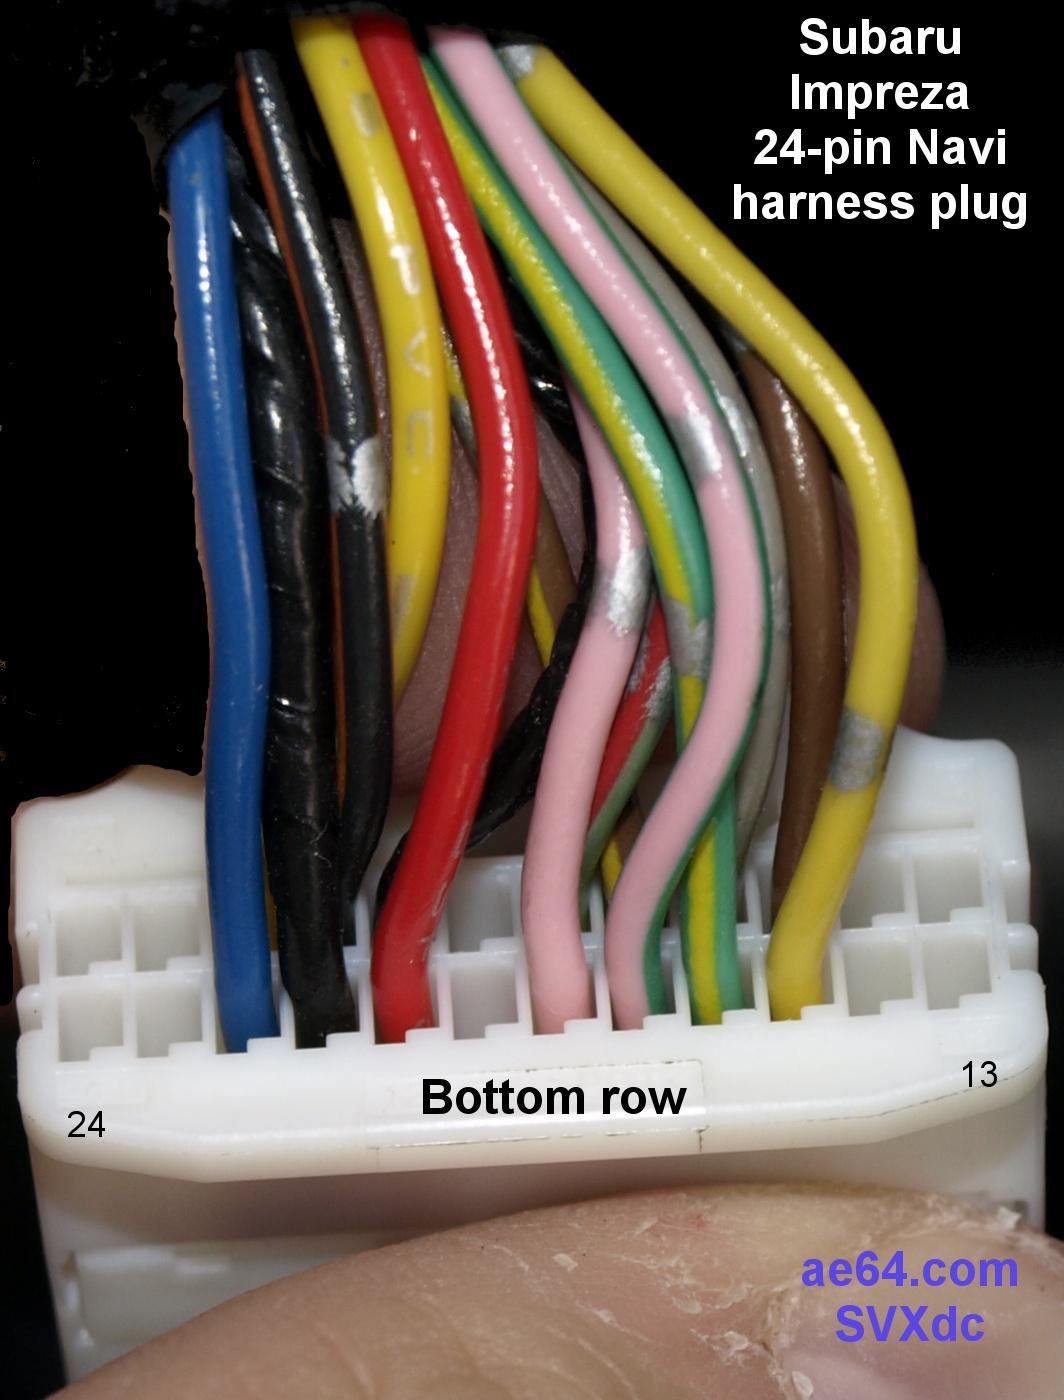 hight resolution of  factory 24 pin navi harness plug bottom